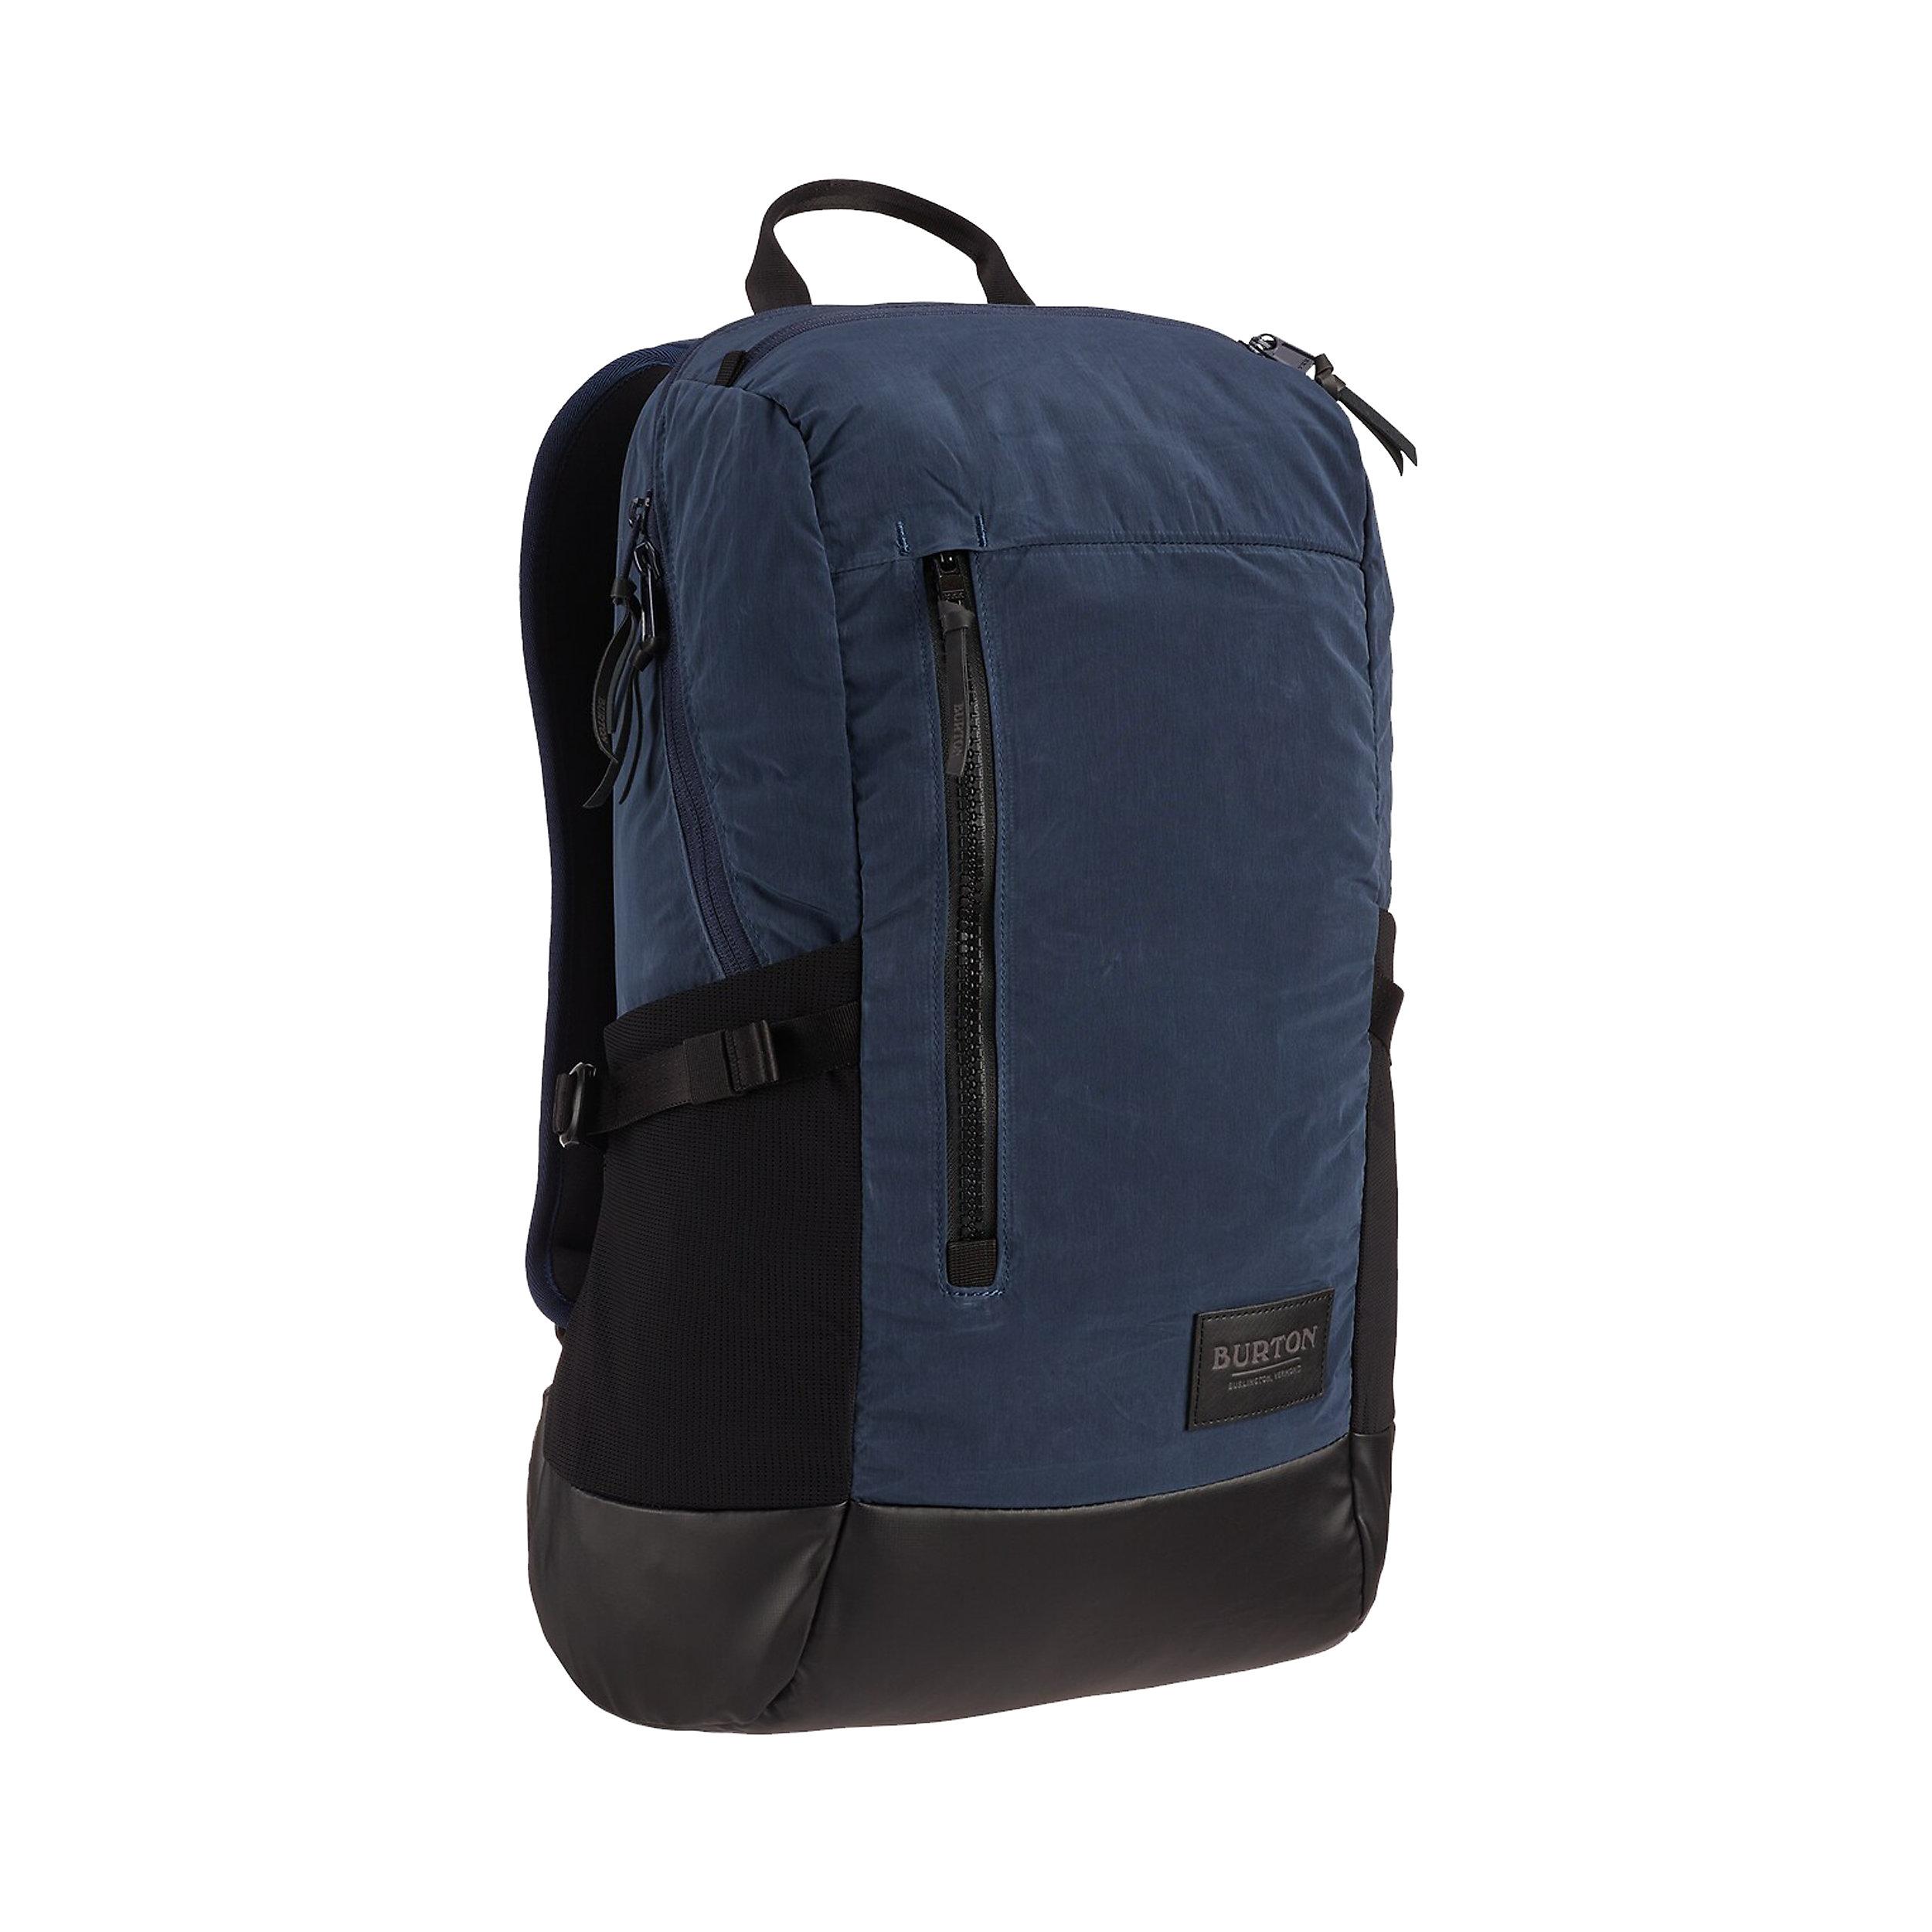 Backpack Prospect 2.0 M 20 Liter